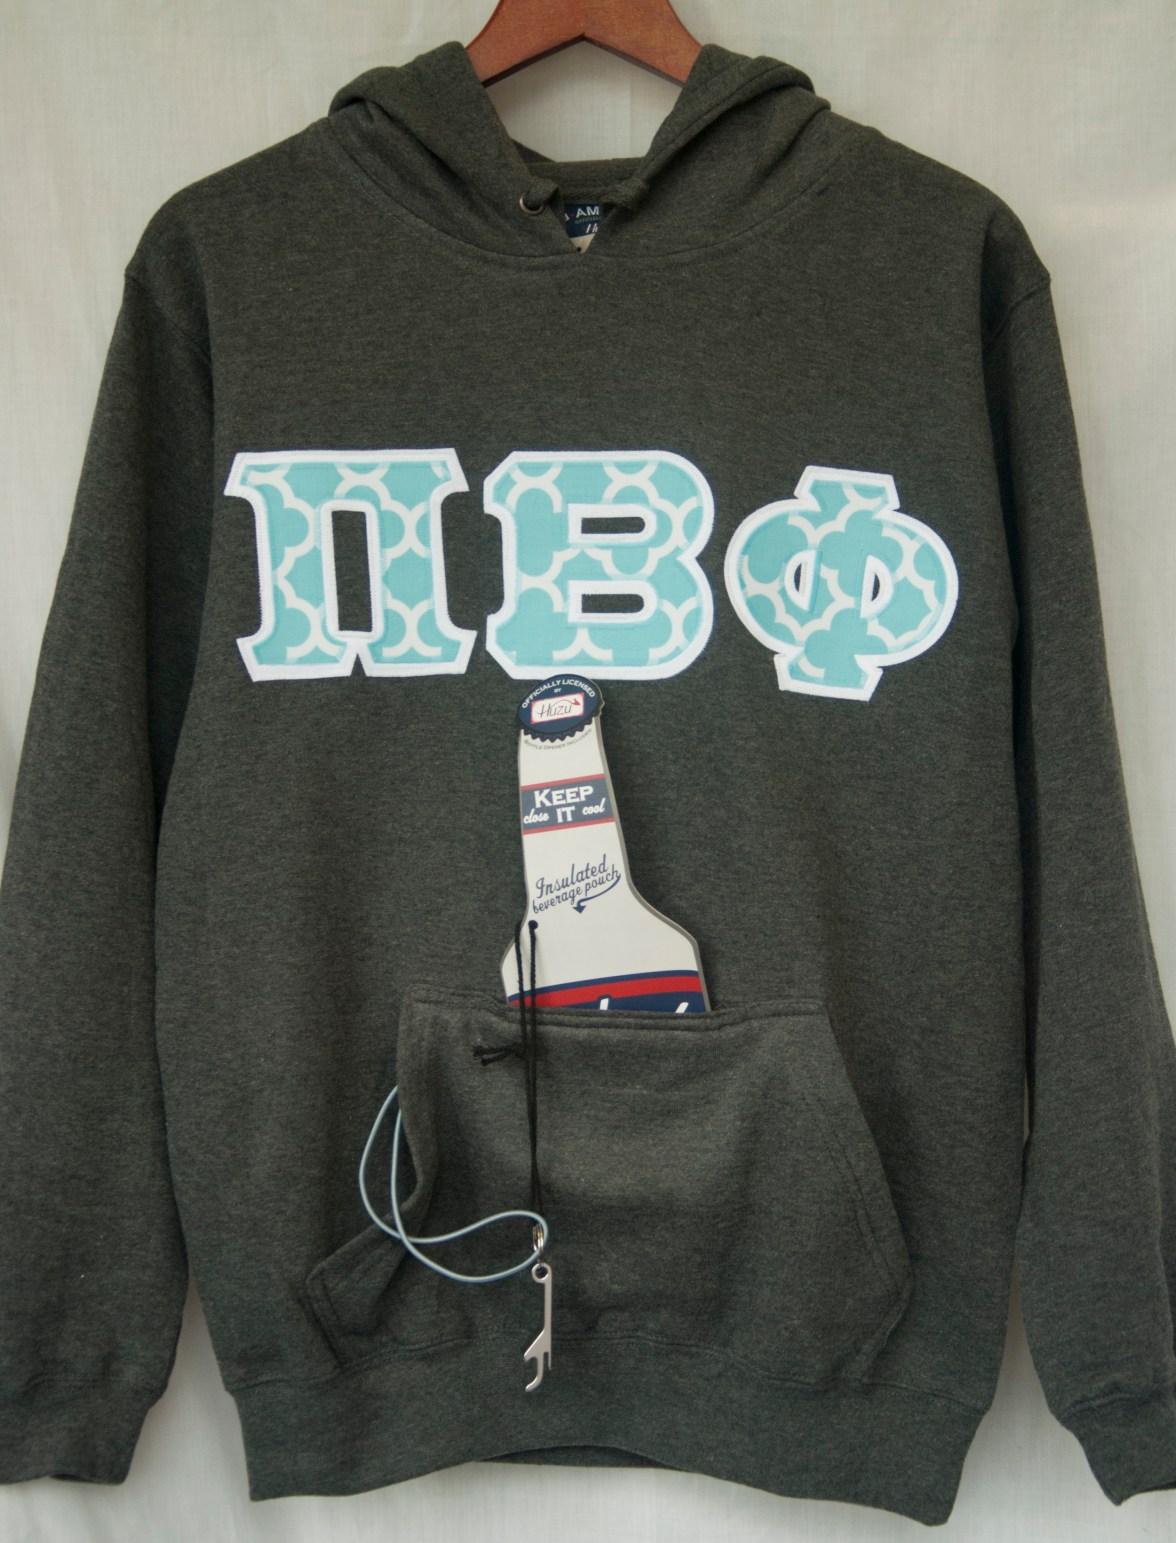 J. America - Tailgate Poly Fleece Hooded Pullover Sweatshirt - Charcoal | http://goo.gl/trq1oO